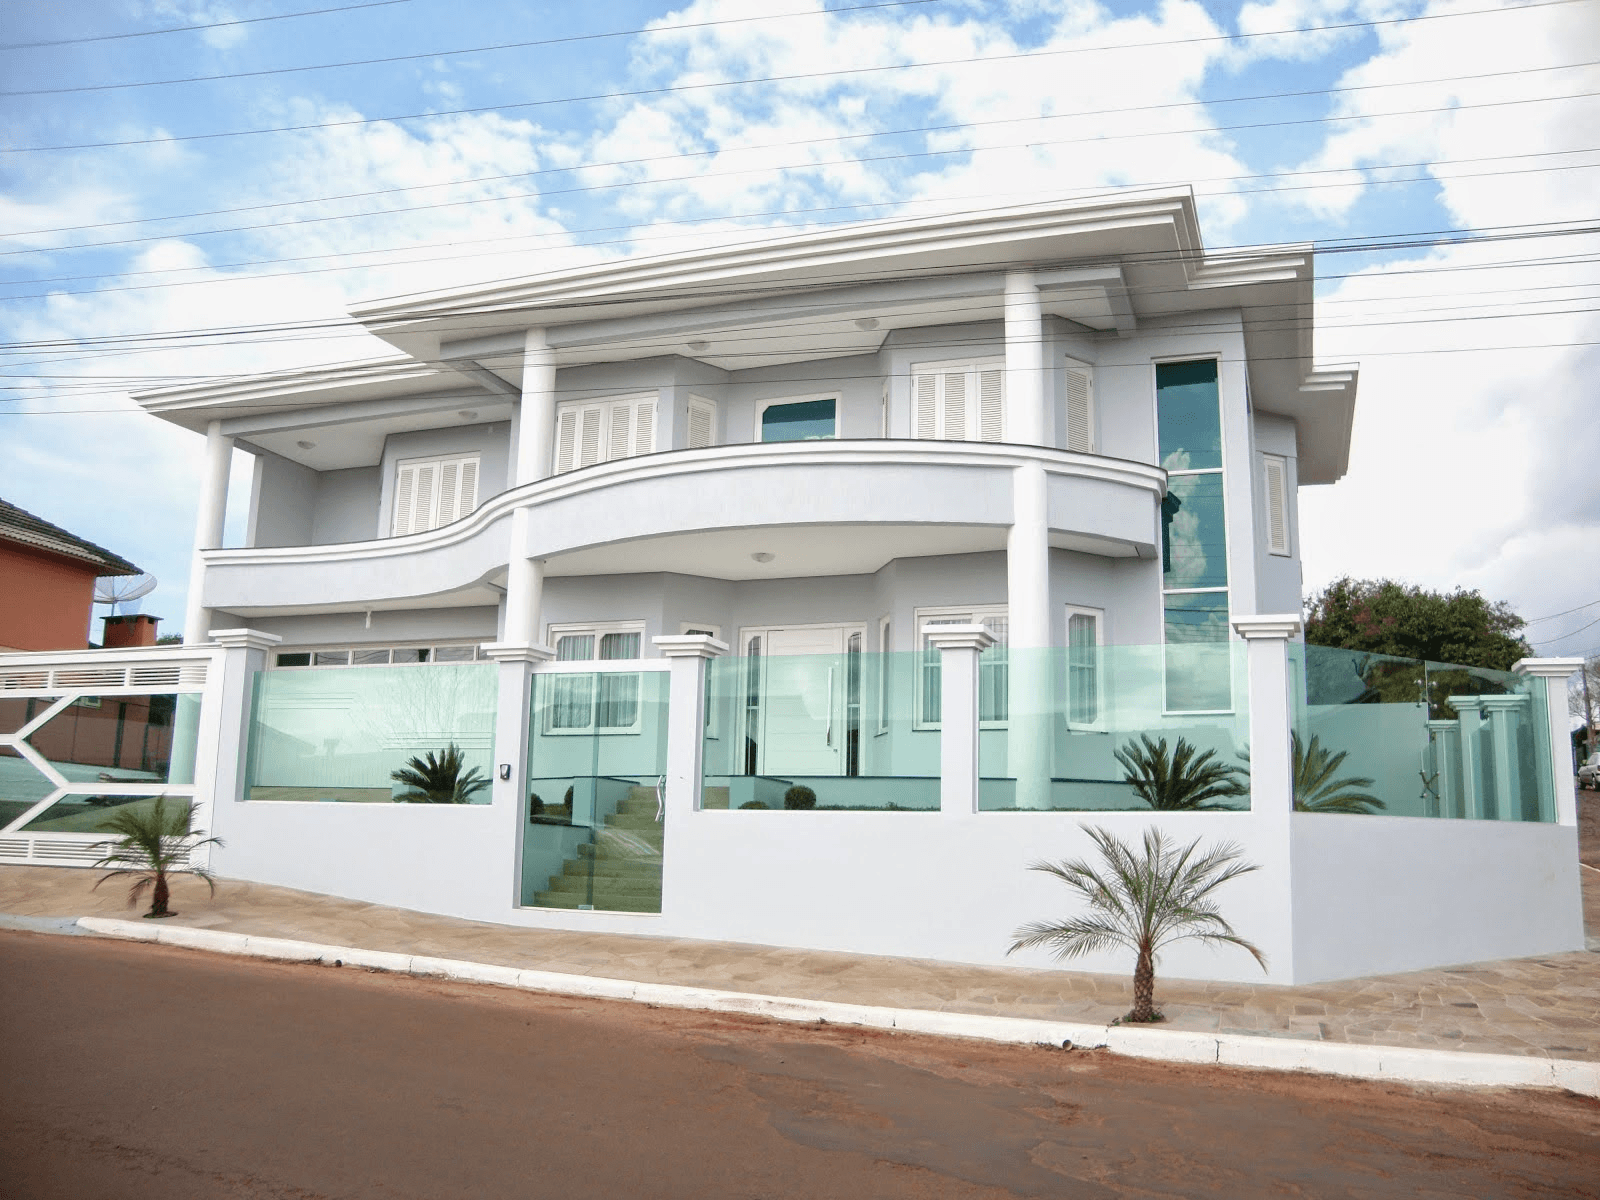 60 modelos de muros residenciais fachadas fotos e dicas for Fachadas de casas chicas